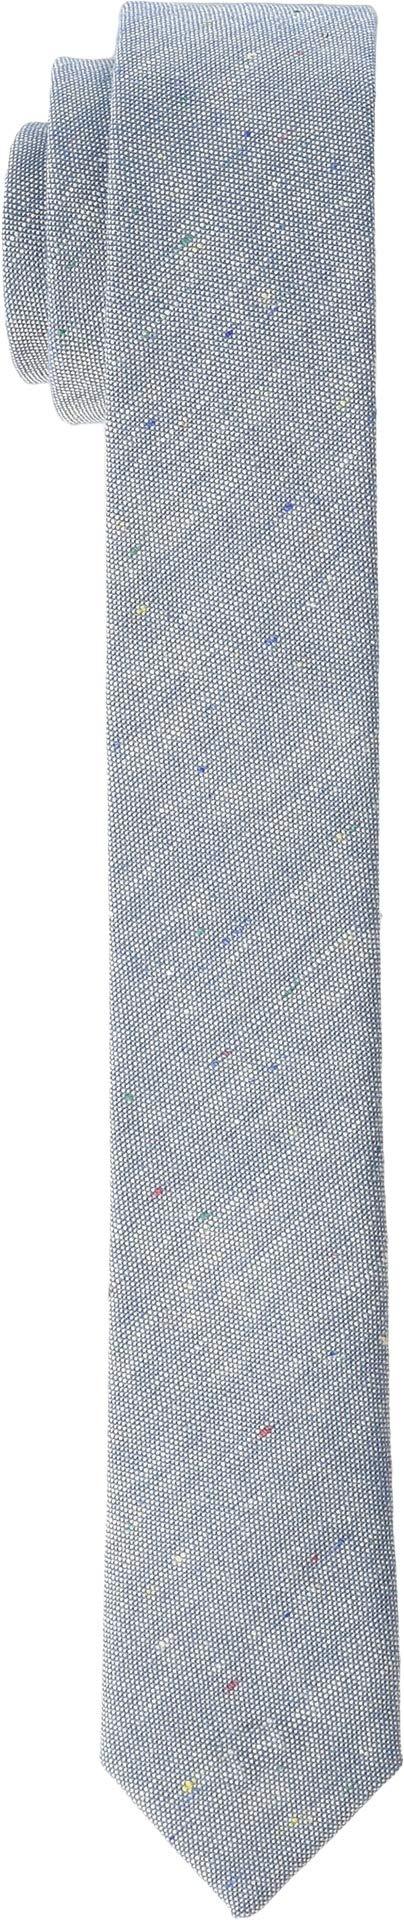 Appaman Kids Baby Boy's Skinny Tie (Toddler/Little Kids/Big Kids) Sea Speck SM/MD (2 Toddler- 6 Little Kids)